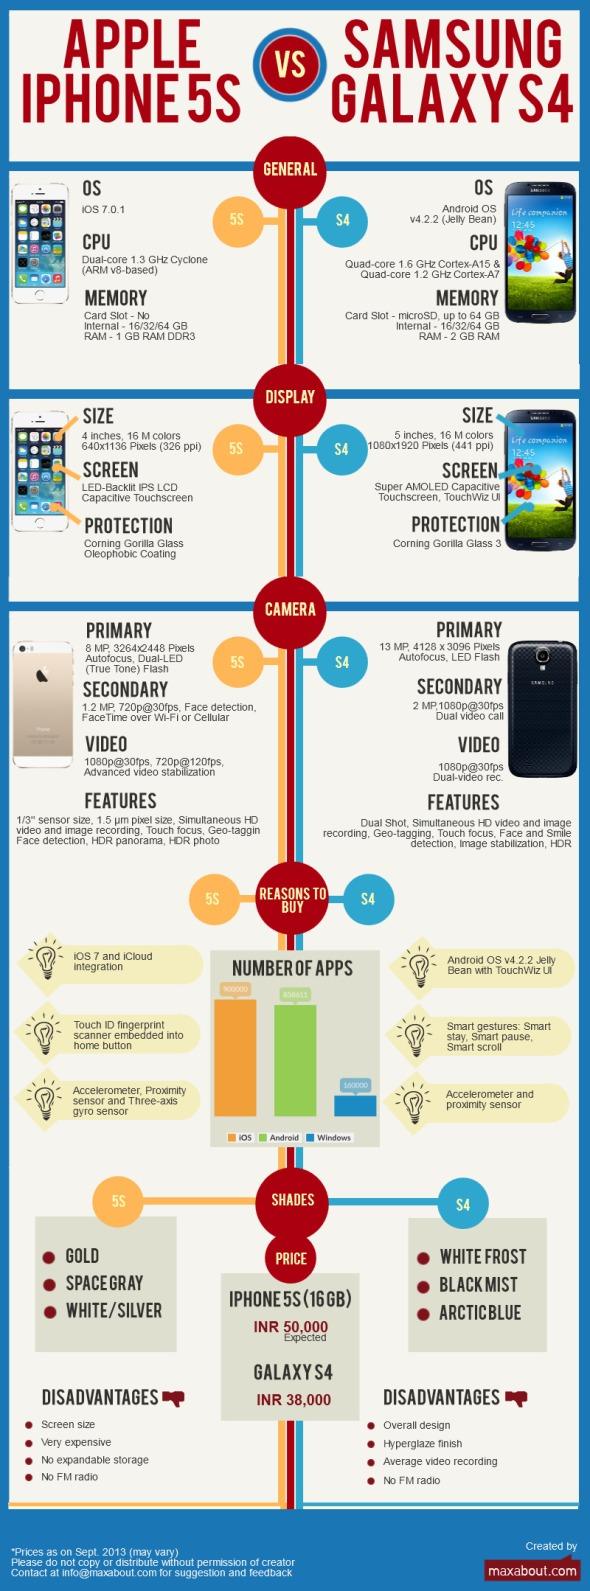 apple-iphone-5s-vs-samsung-galaxy-s4_5249676a7690c